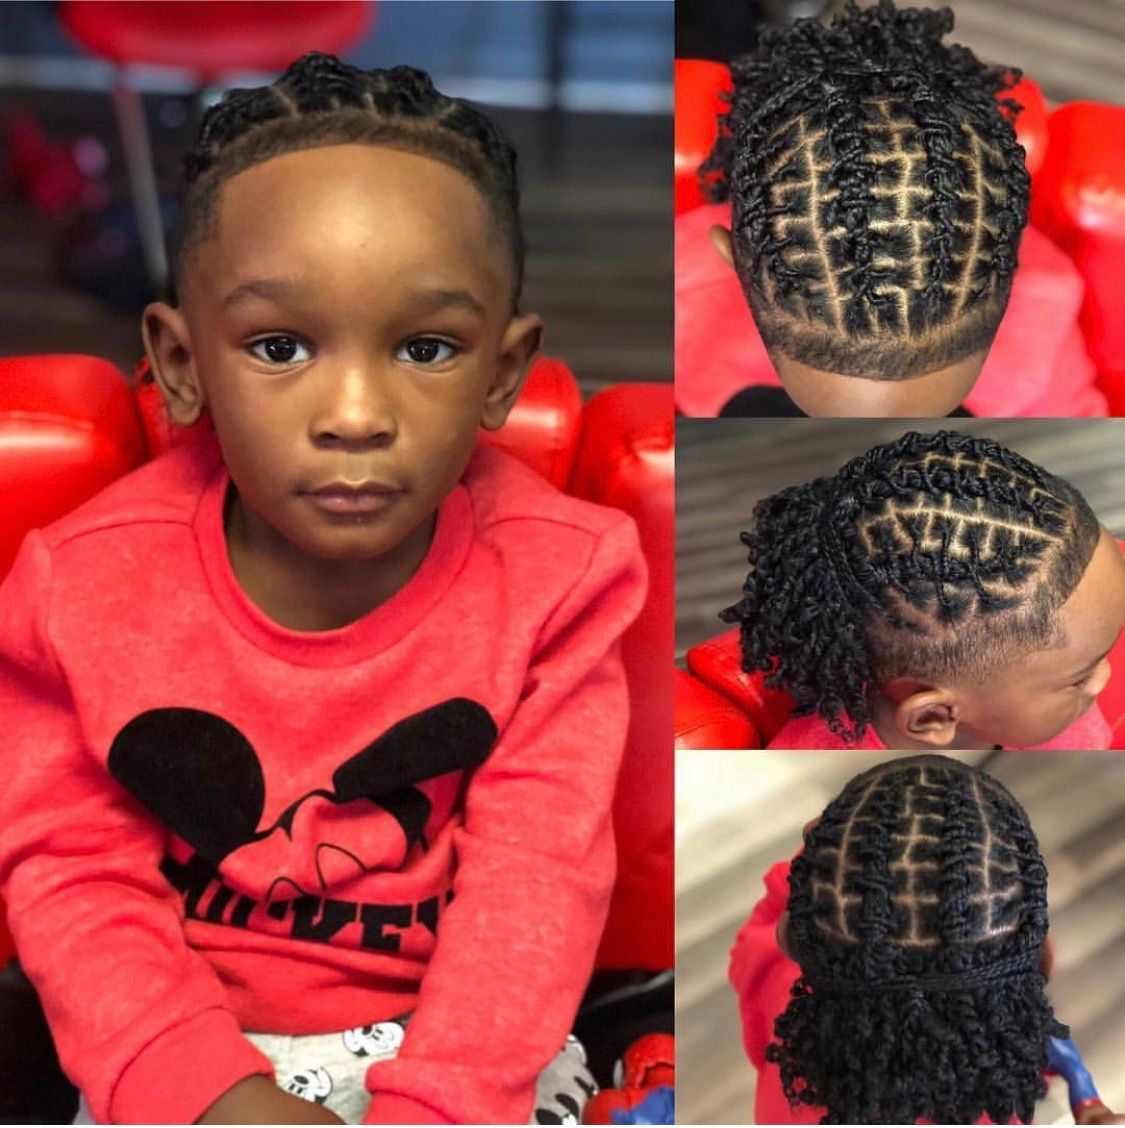 Pin By Jonquille Johnson On Dreadlocks Dreadlock Hairstyles For Men Braids For Boys Black Boy Hairstyles